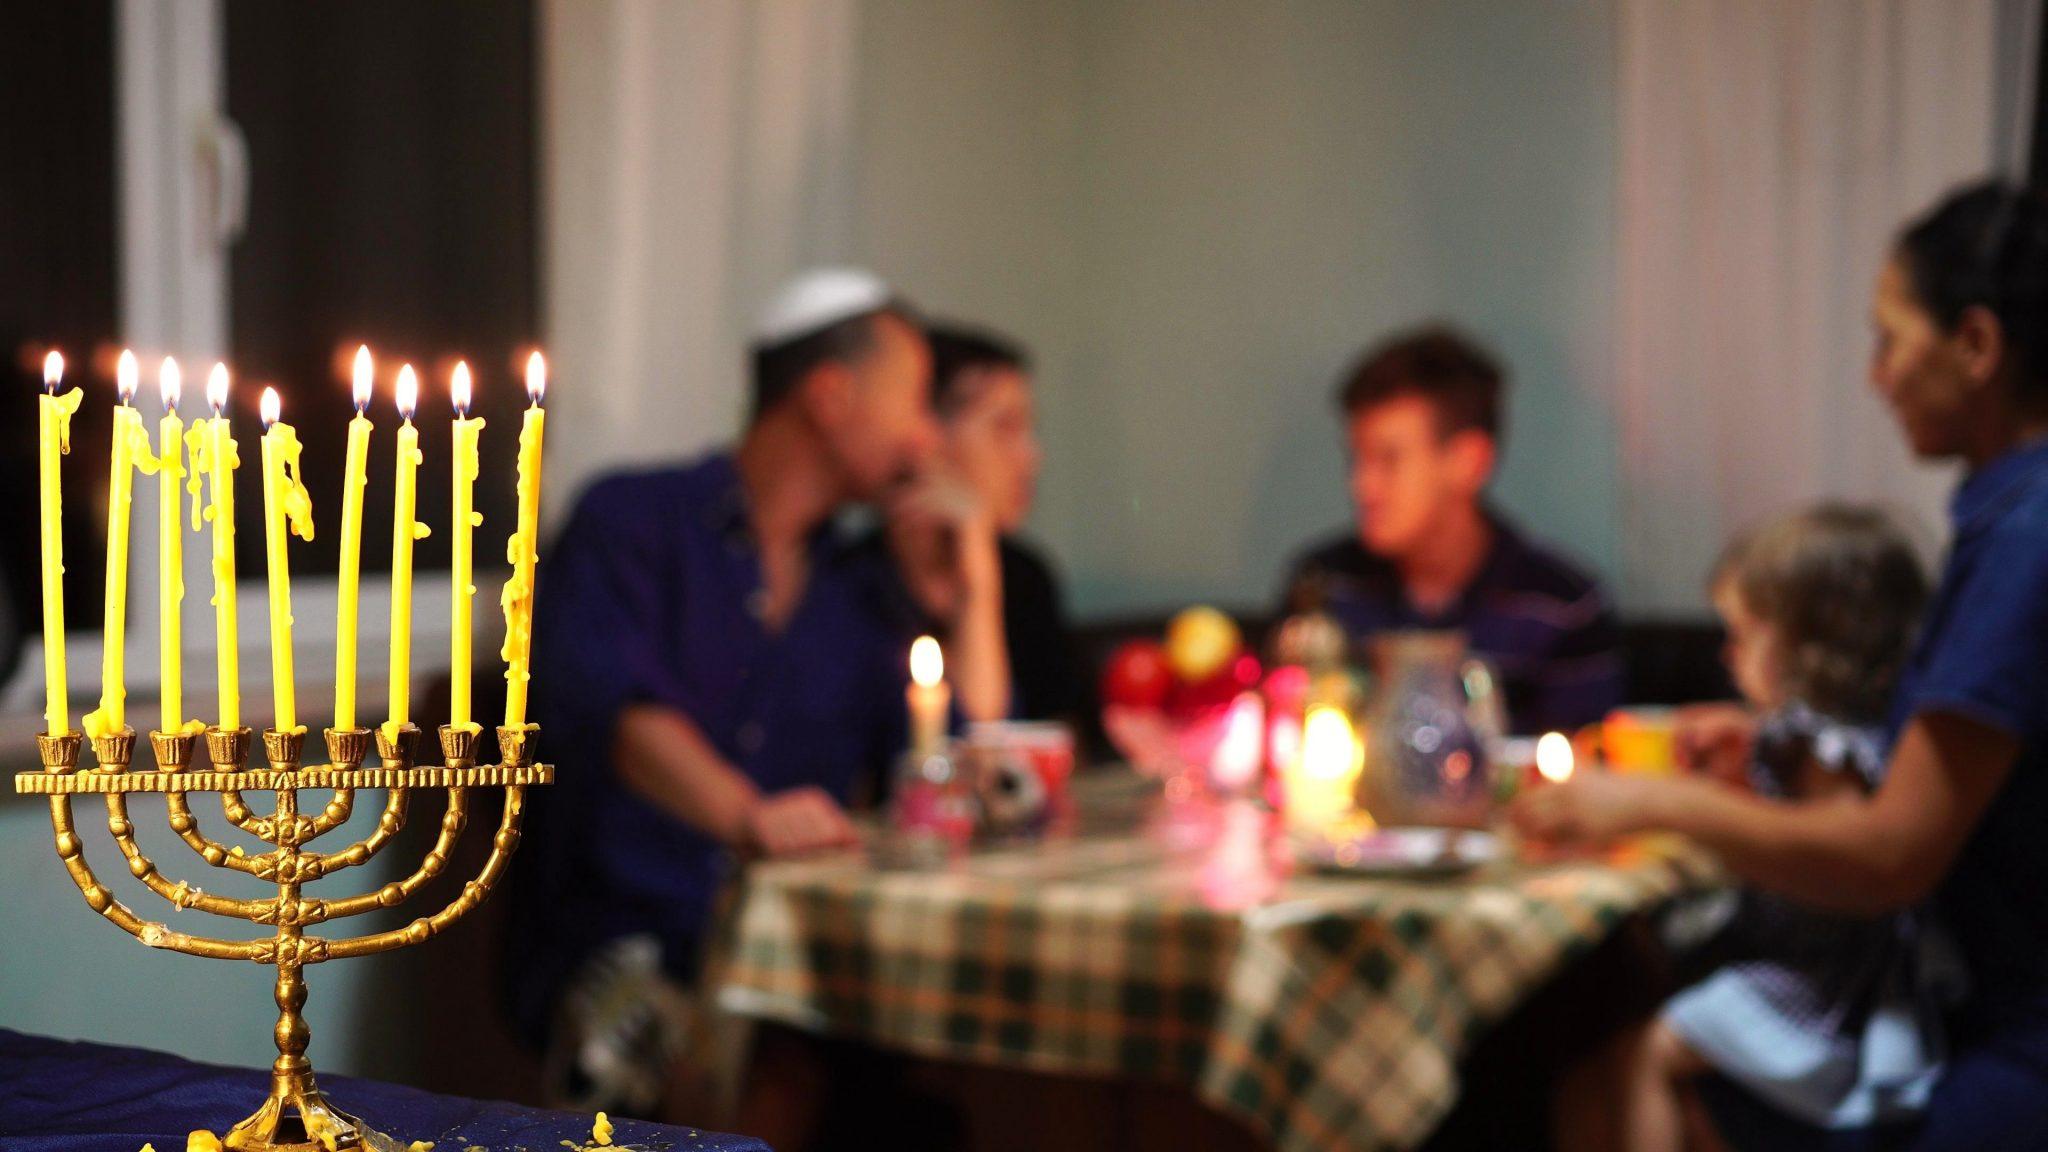 IM MUSLIM GET OVER IT  islam faith xmas birthday gift ideas boys girls T SHIRT